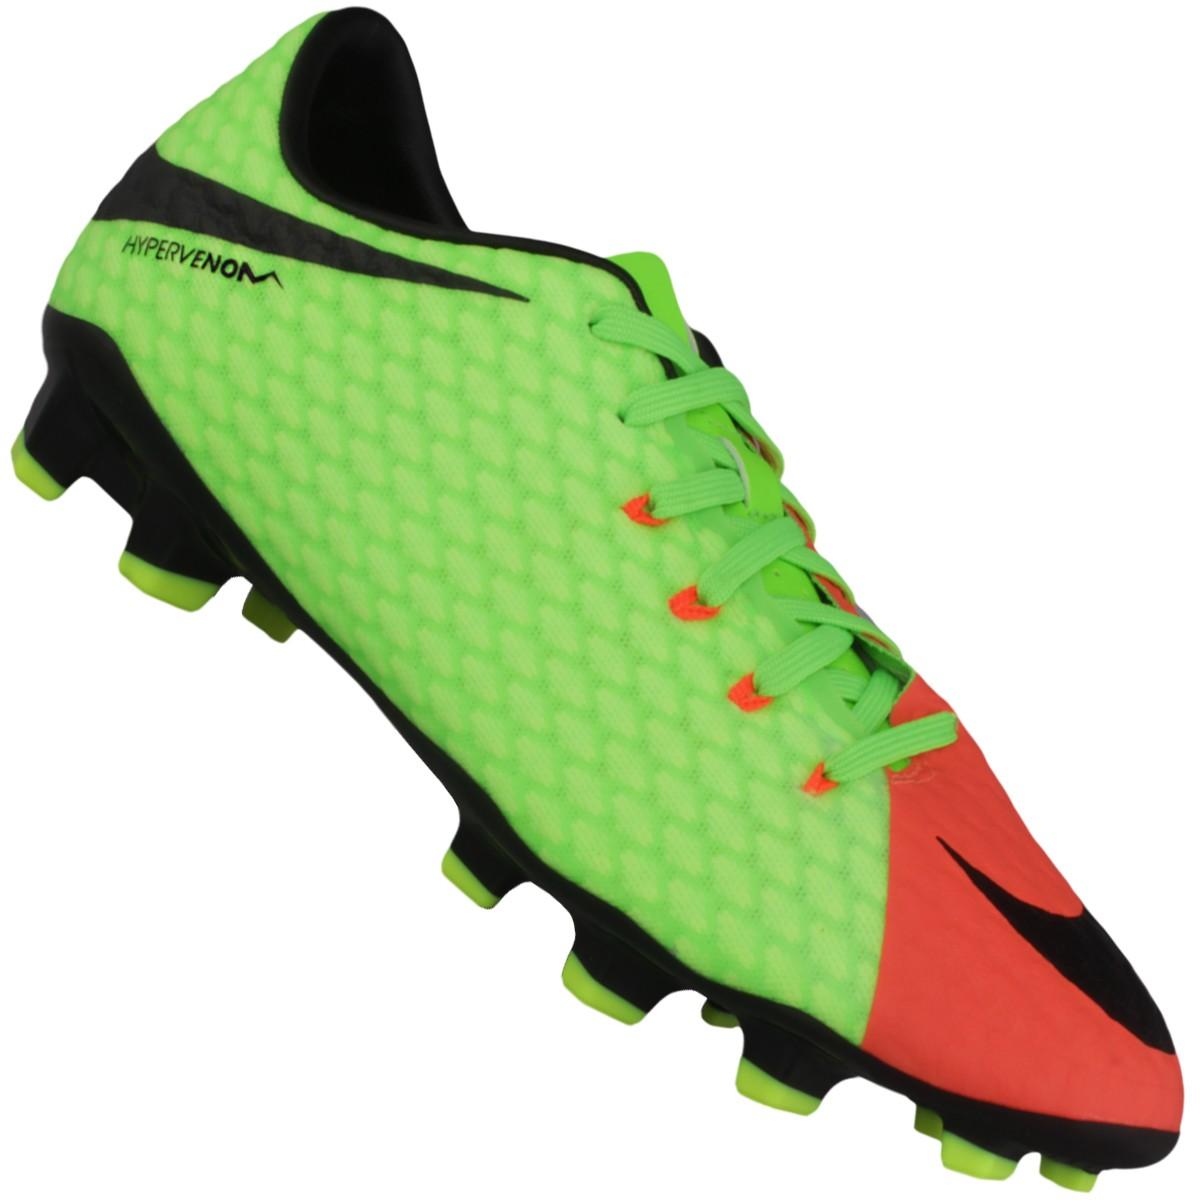 Chuteira Nike Hypervenom Phelon 3 FG 47b04348b94ed